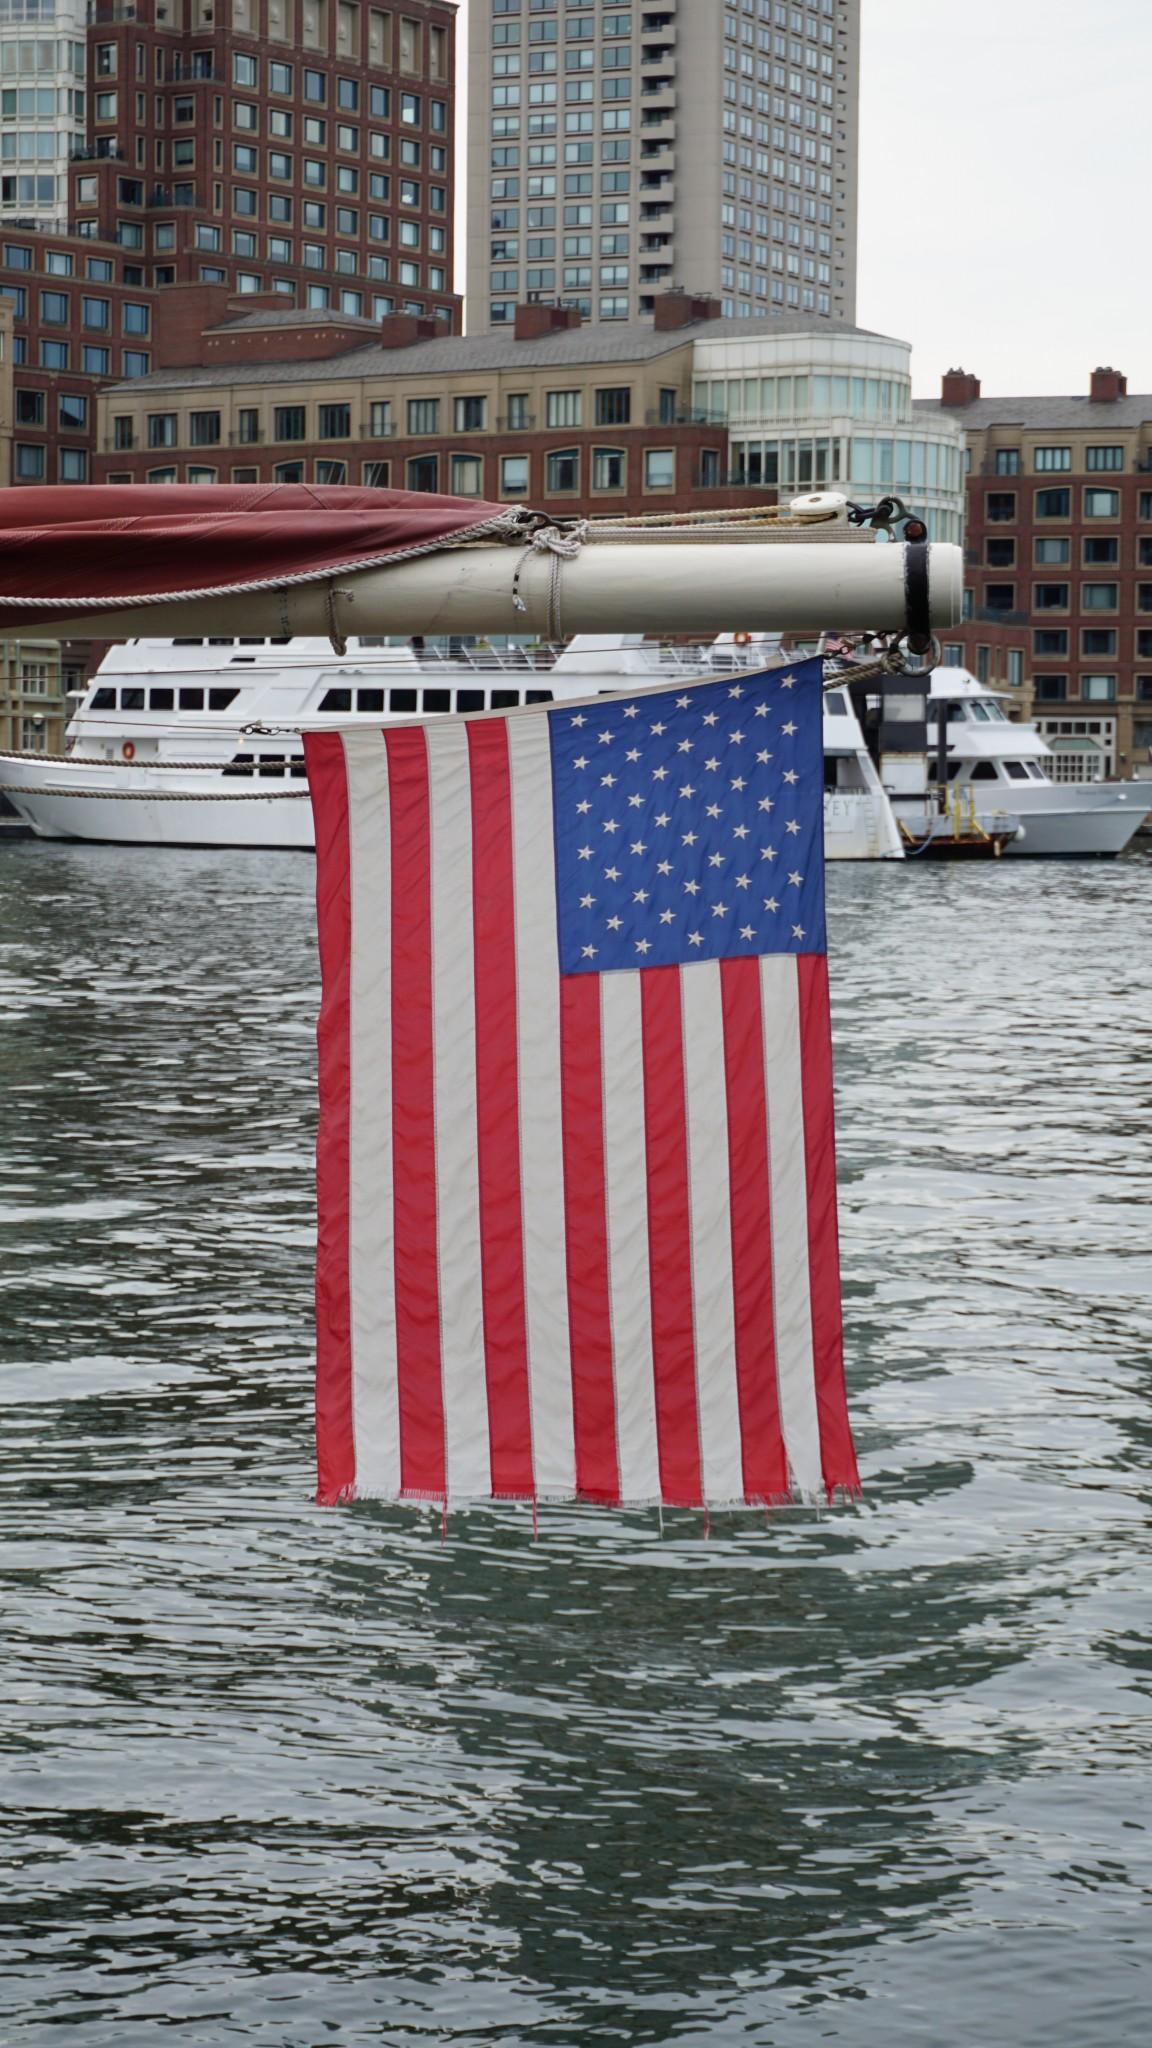 american flag boston harbor, the-alyst.com